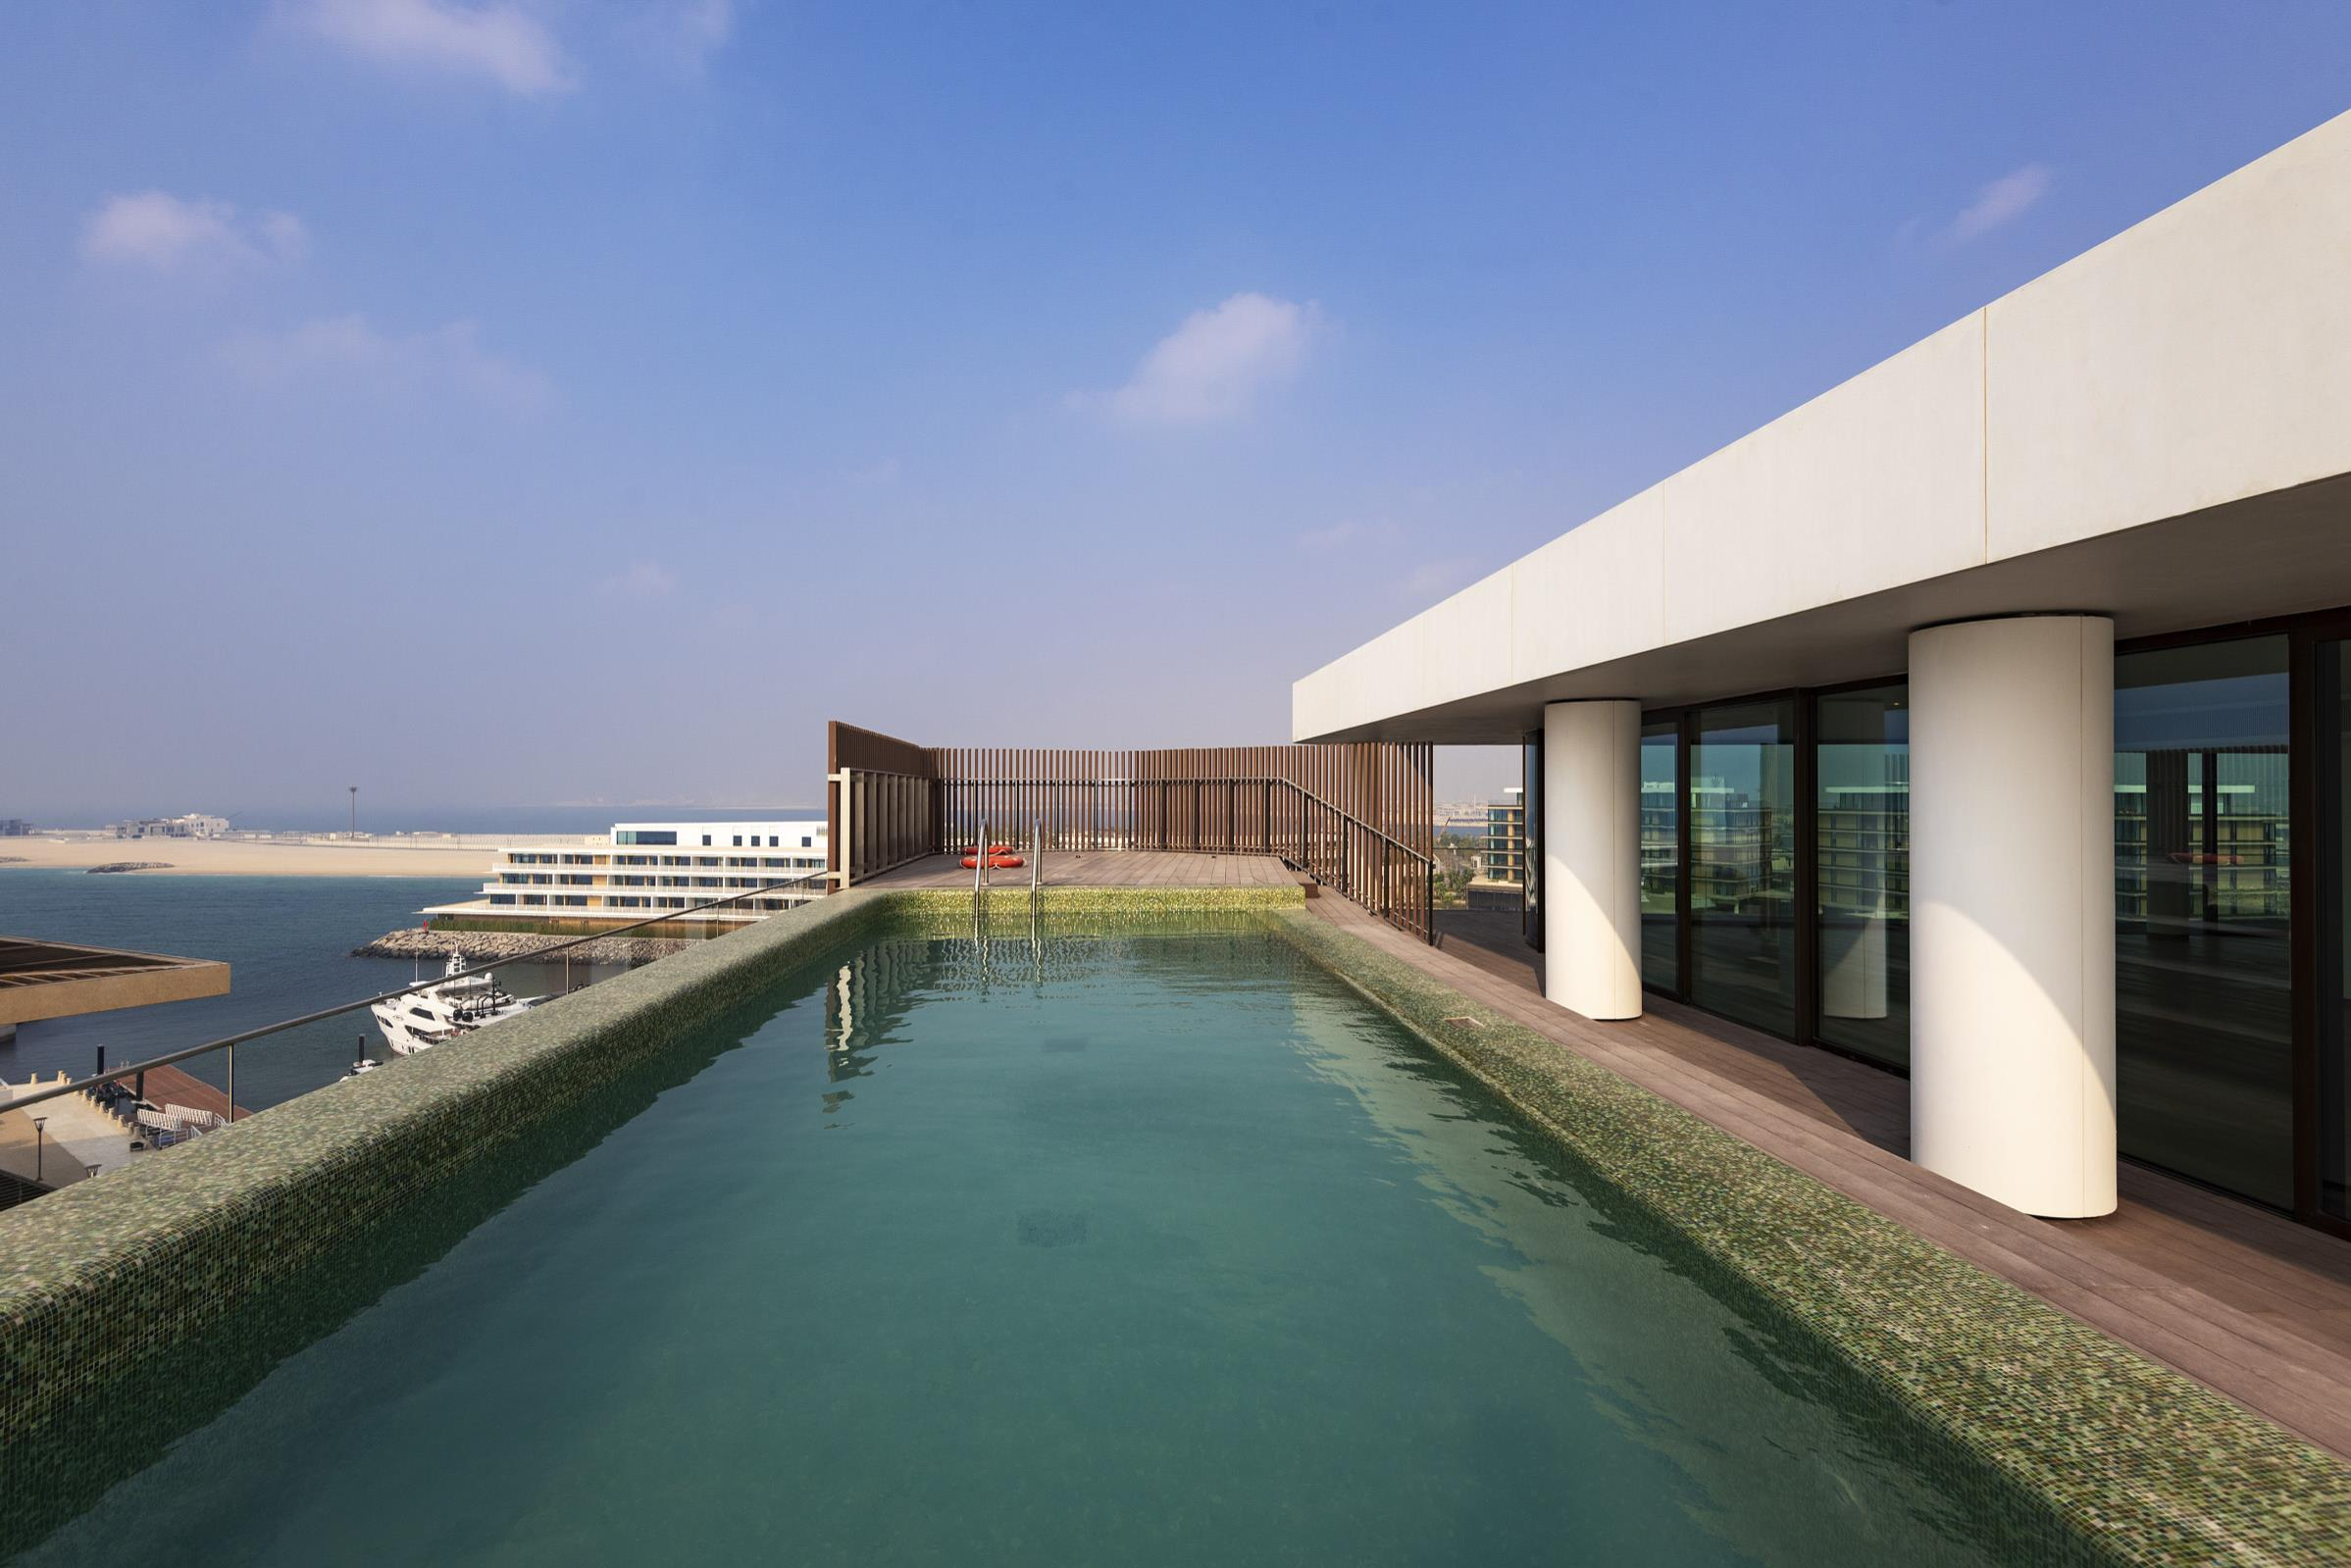 4 Bedroom | Bvlgari Penthouse | FULL FLOOR